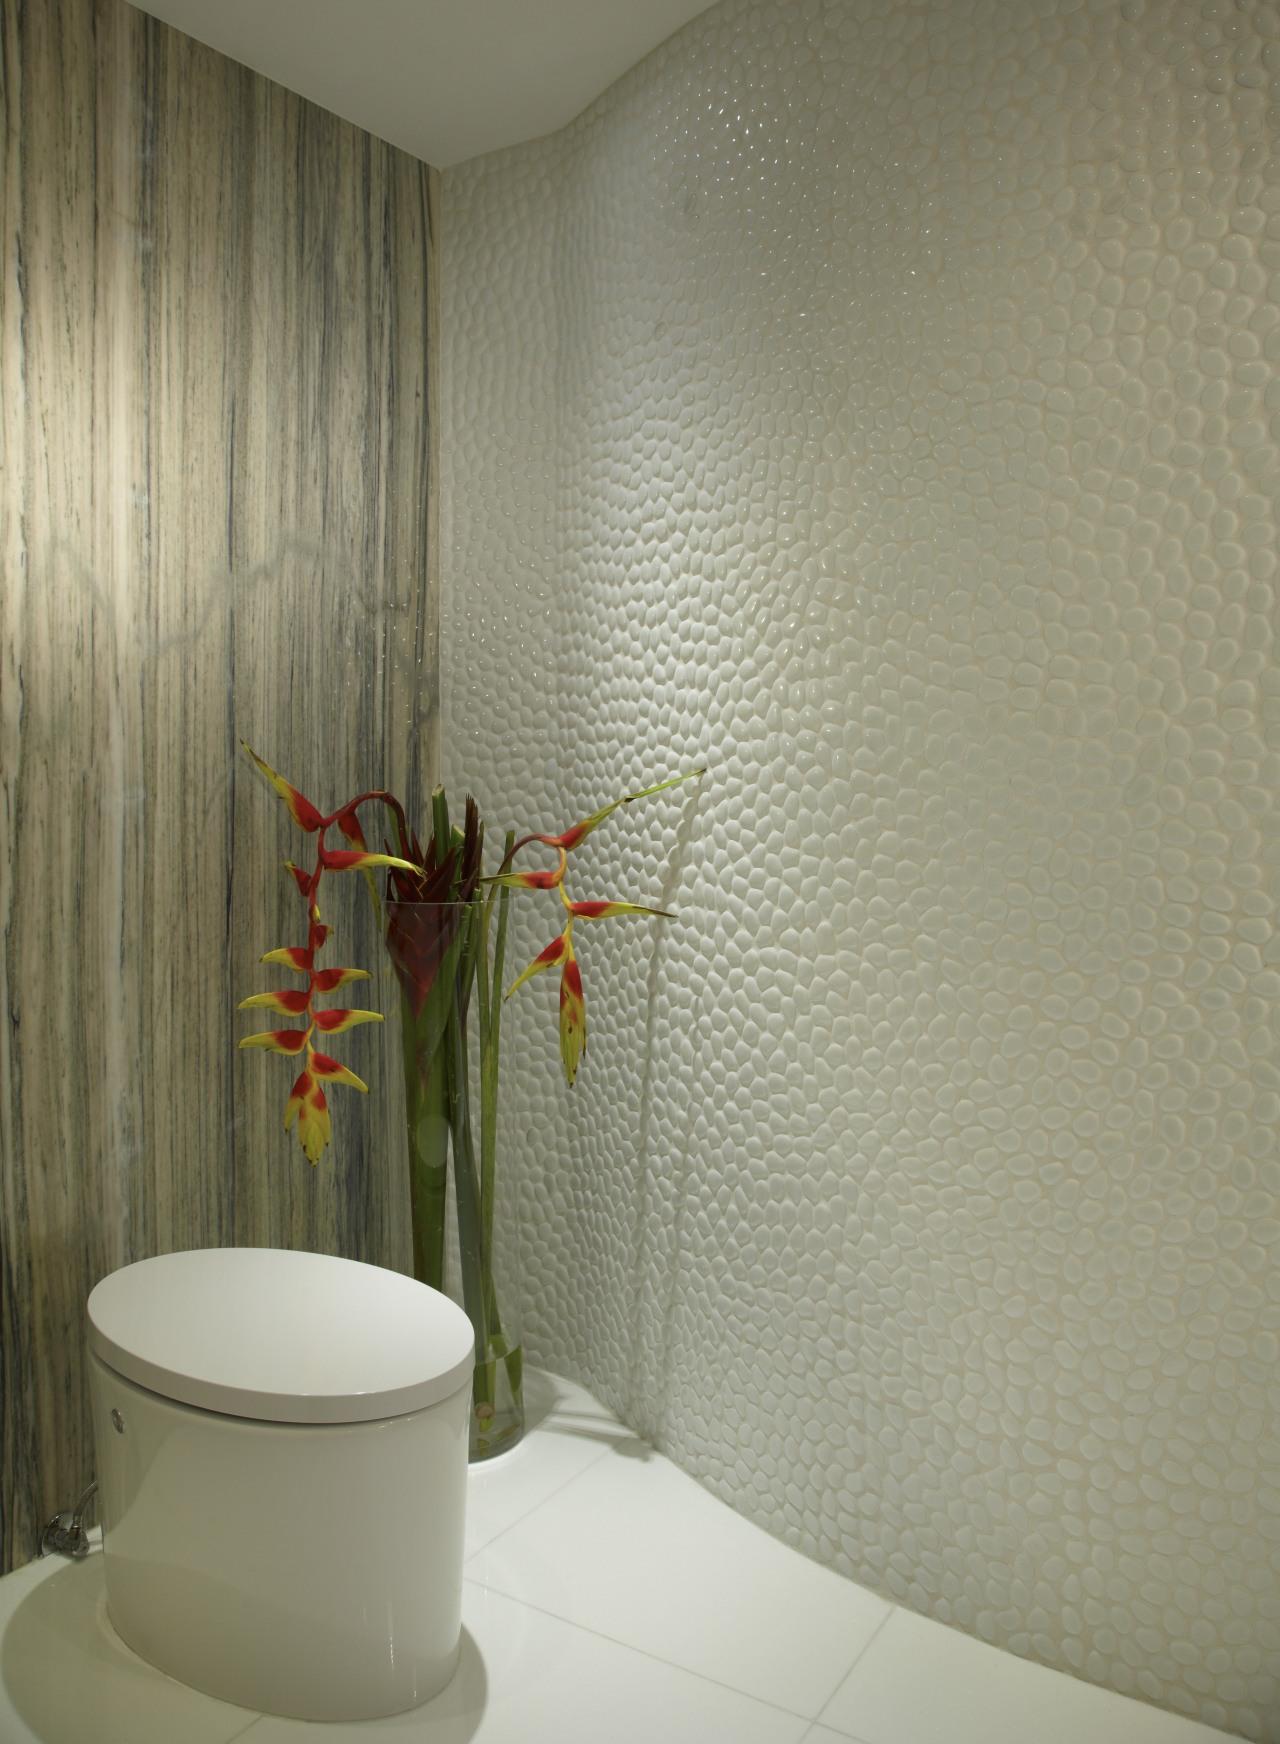 A curvaceous wall and contrasting textures create interest bathroom, ceramic, floor, flooring, interior design, plumbing fixture, room, tap, tile, toilet seat, wall, orange